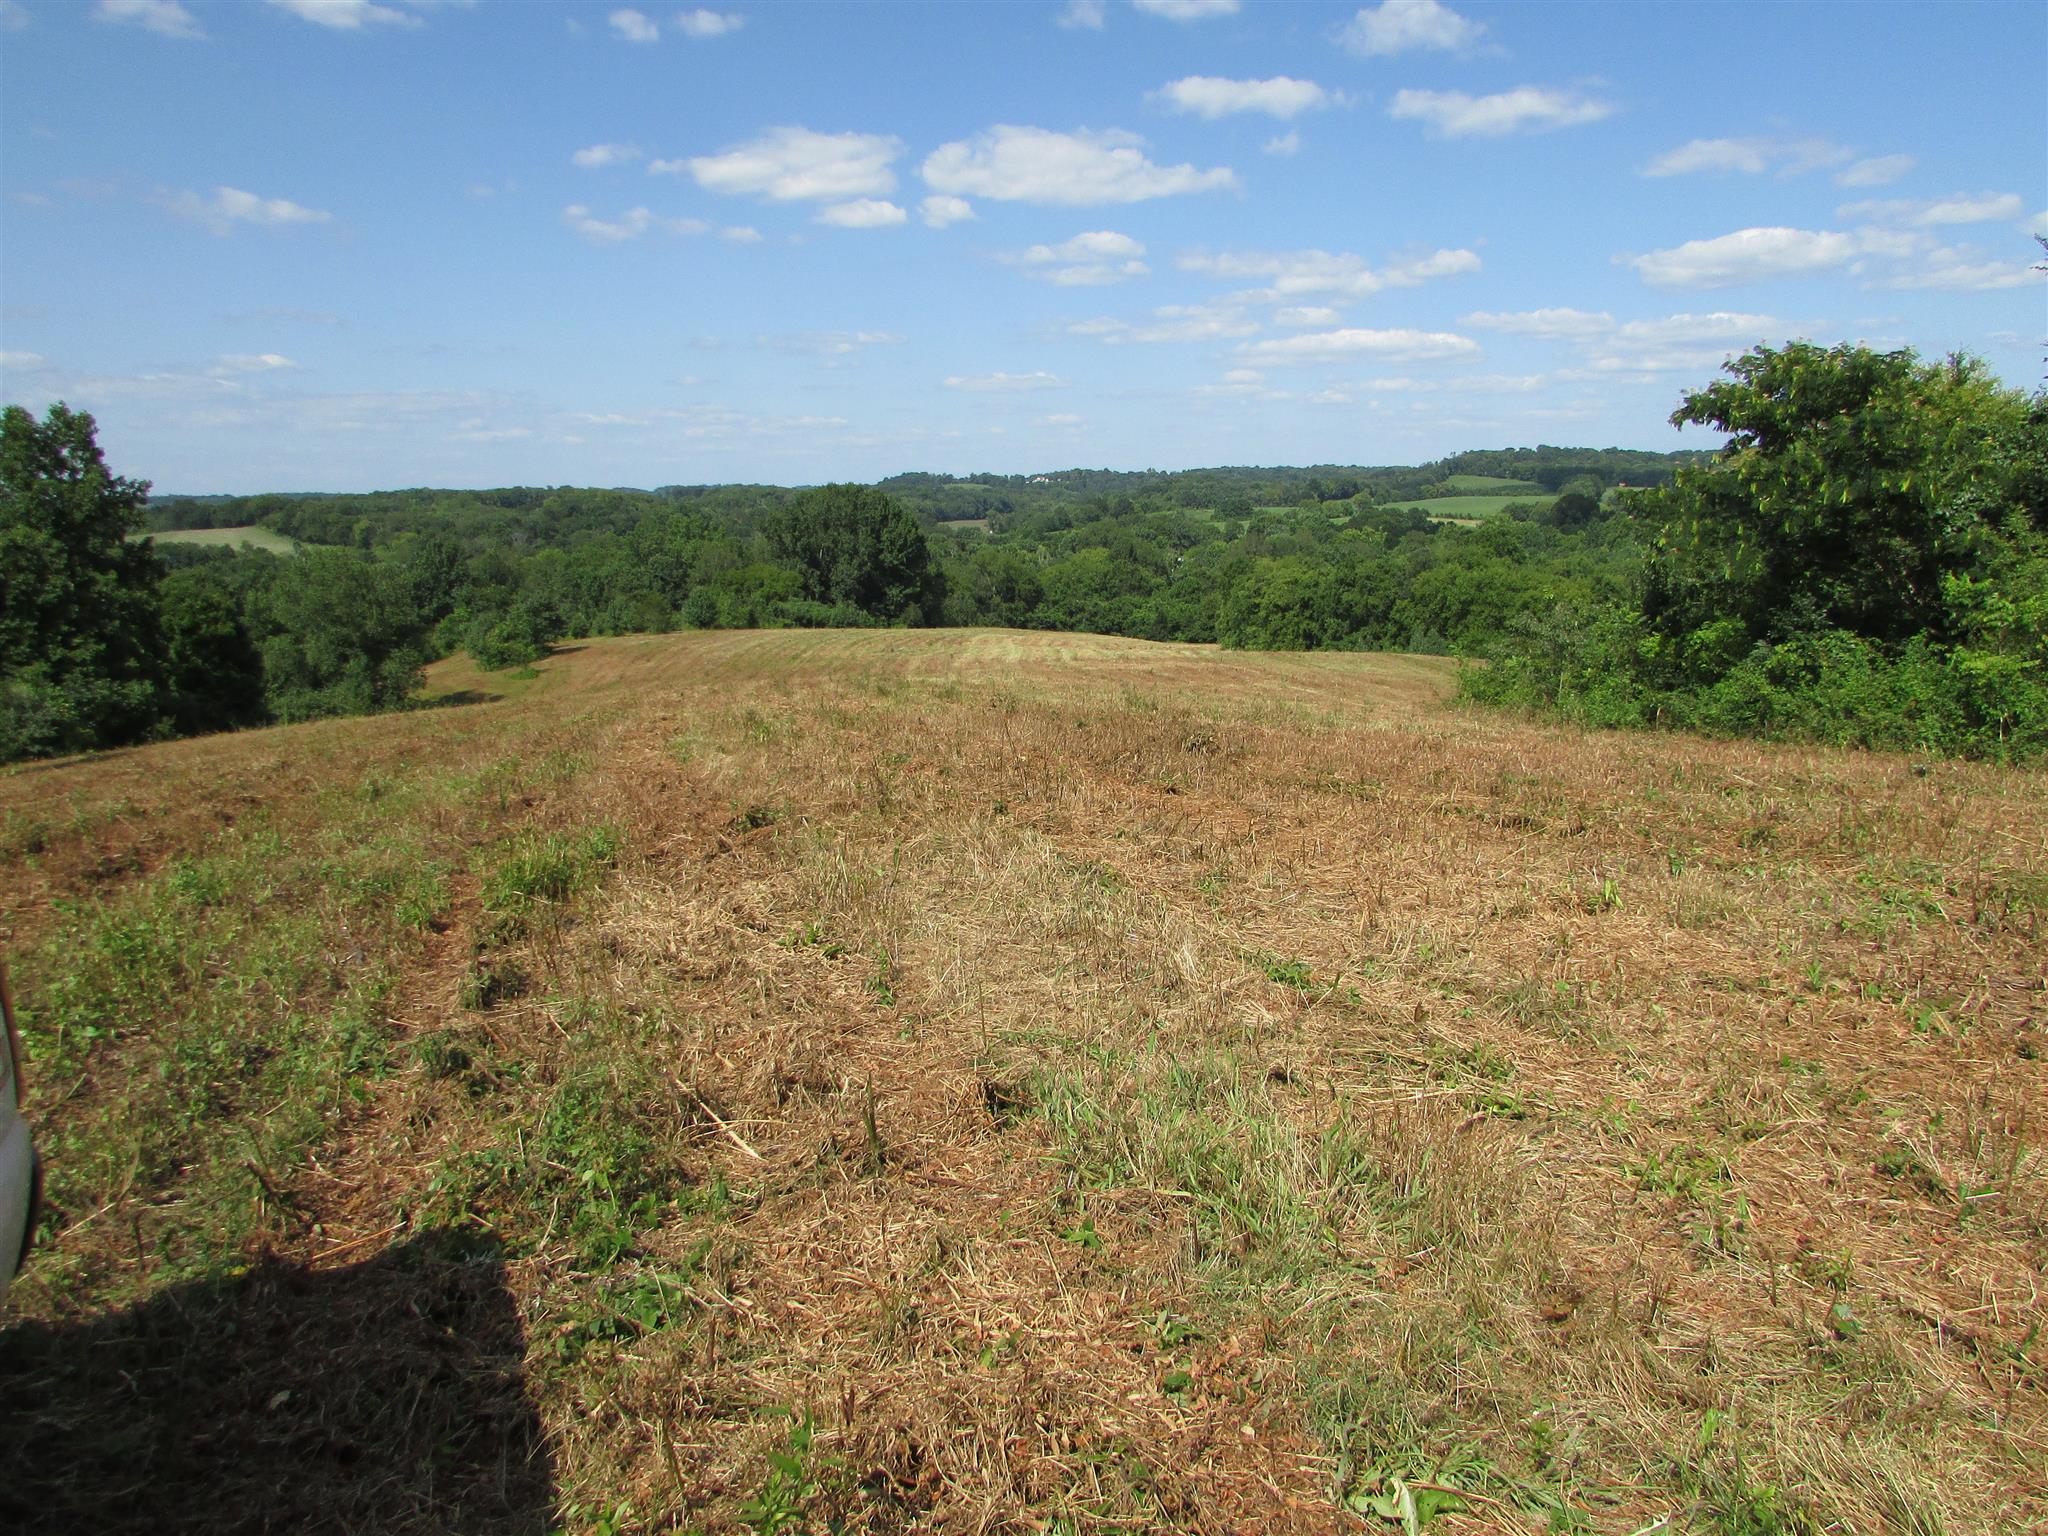 3089 Williamsport Pike, Williamsport, TN 38487 - Williamsport, TN real estate listing